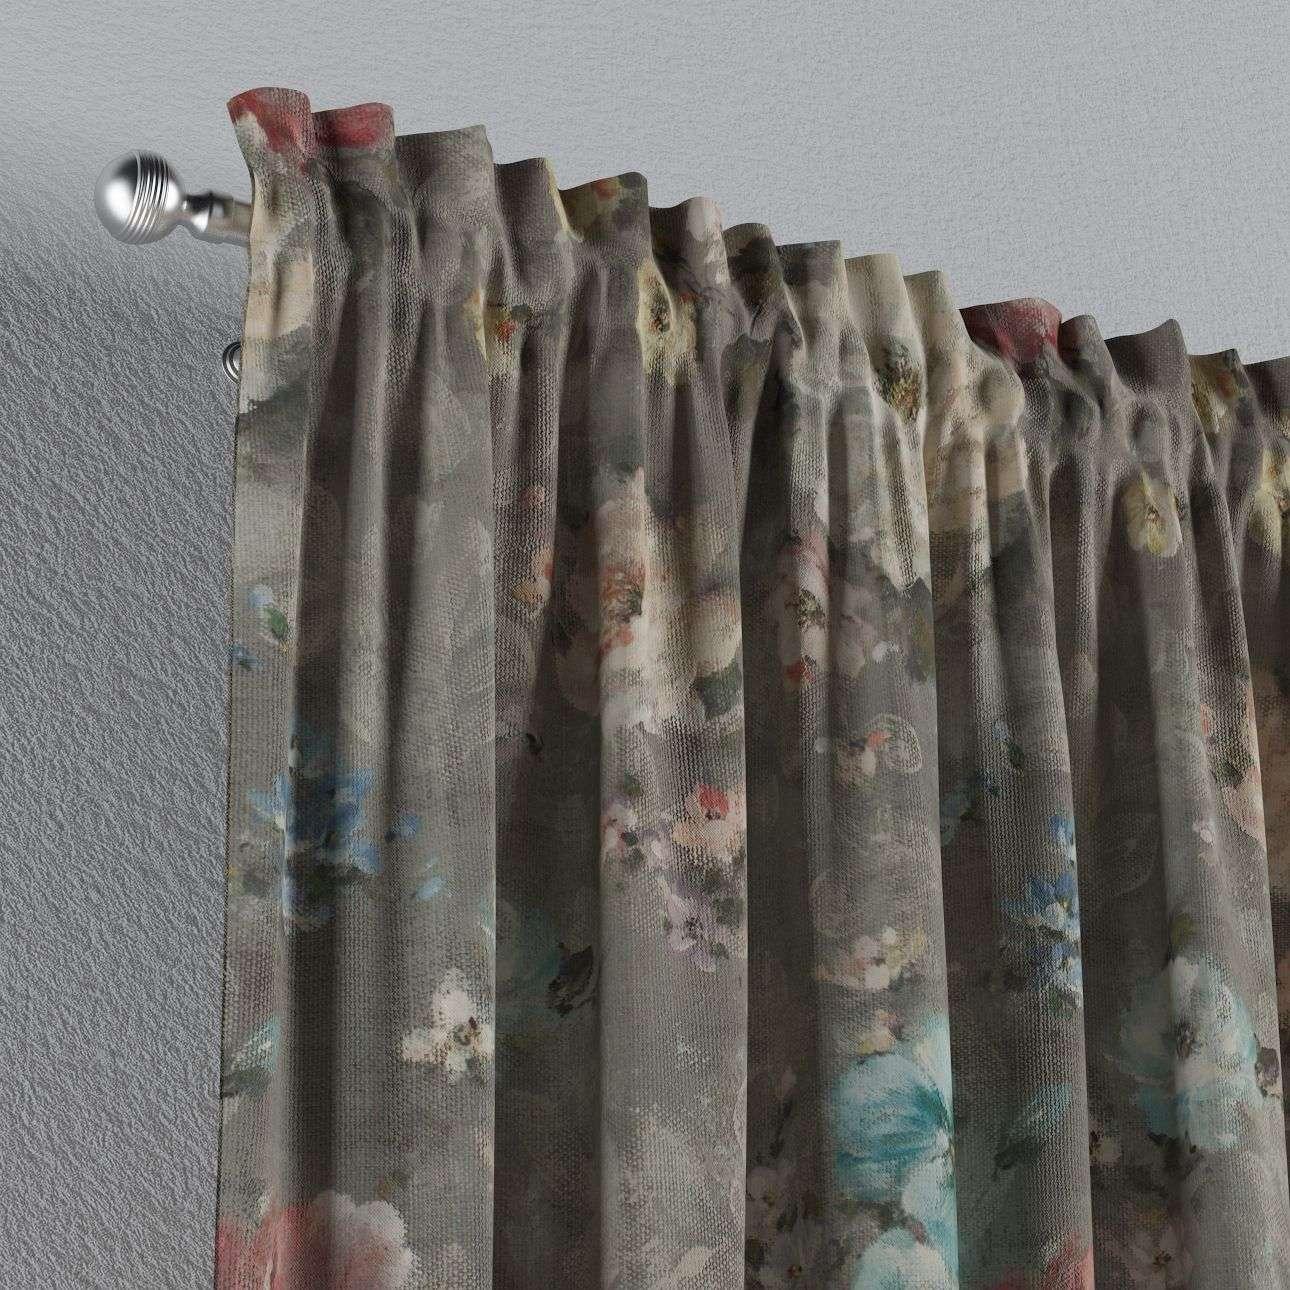 Závěs s tunýlkem a volánkem 130 × 260 cm v kolekci Monet, látka: 137-81